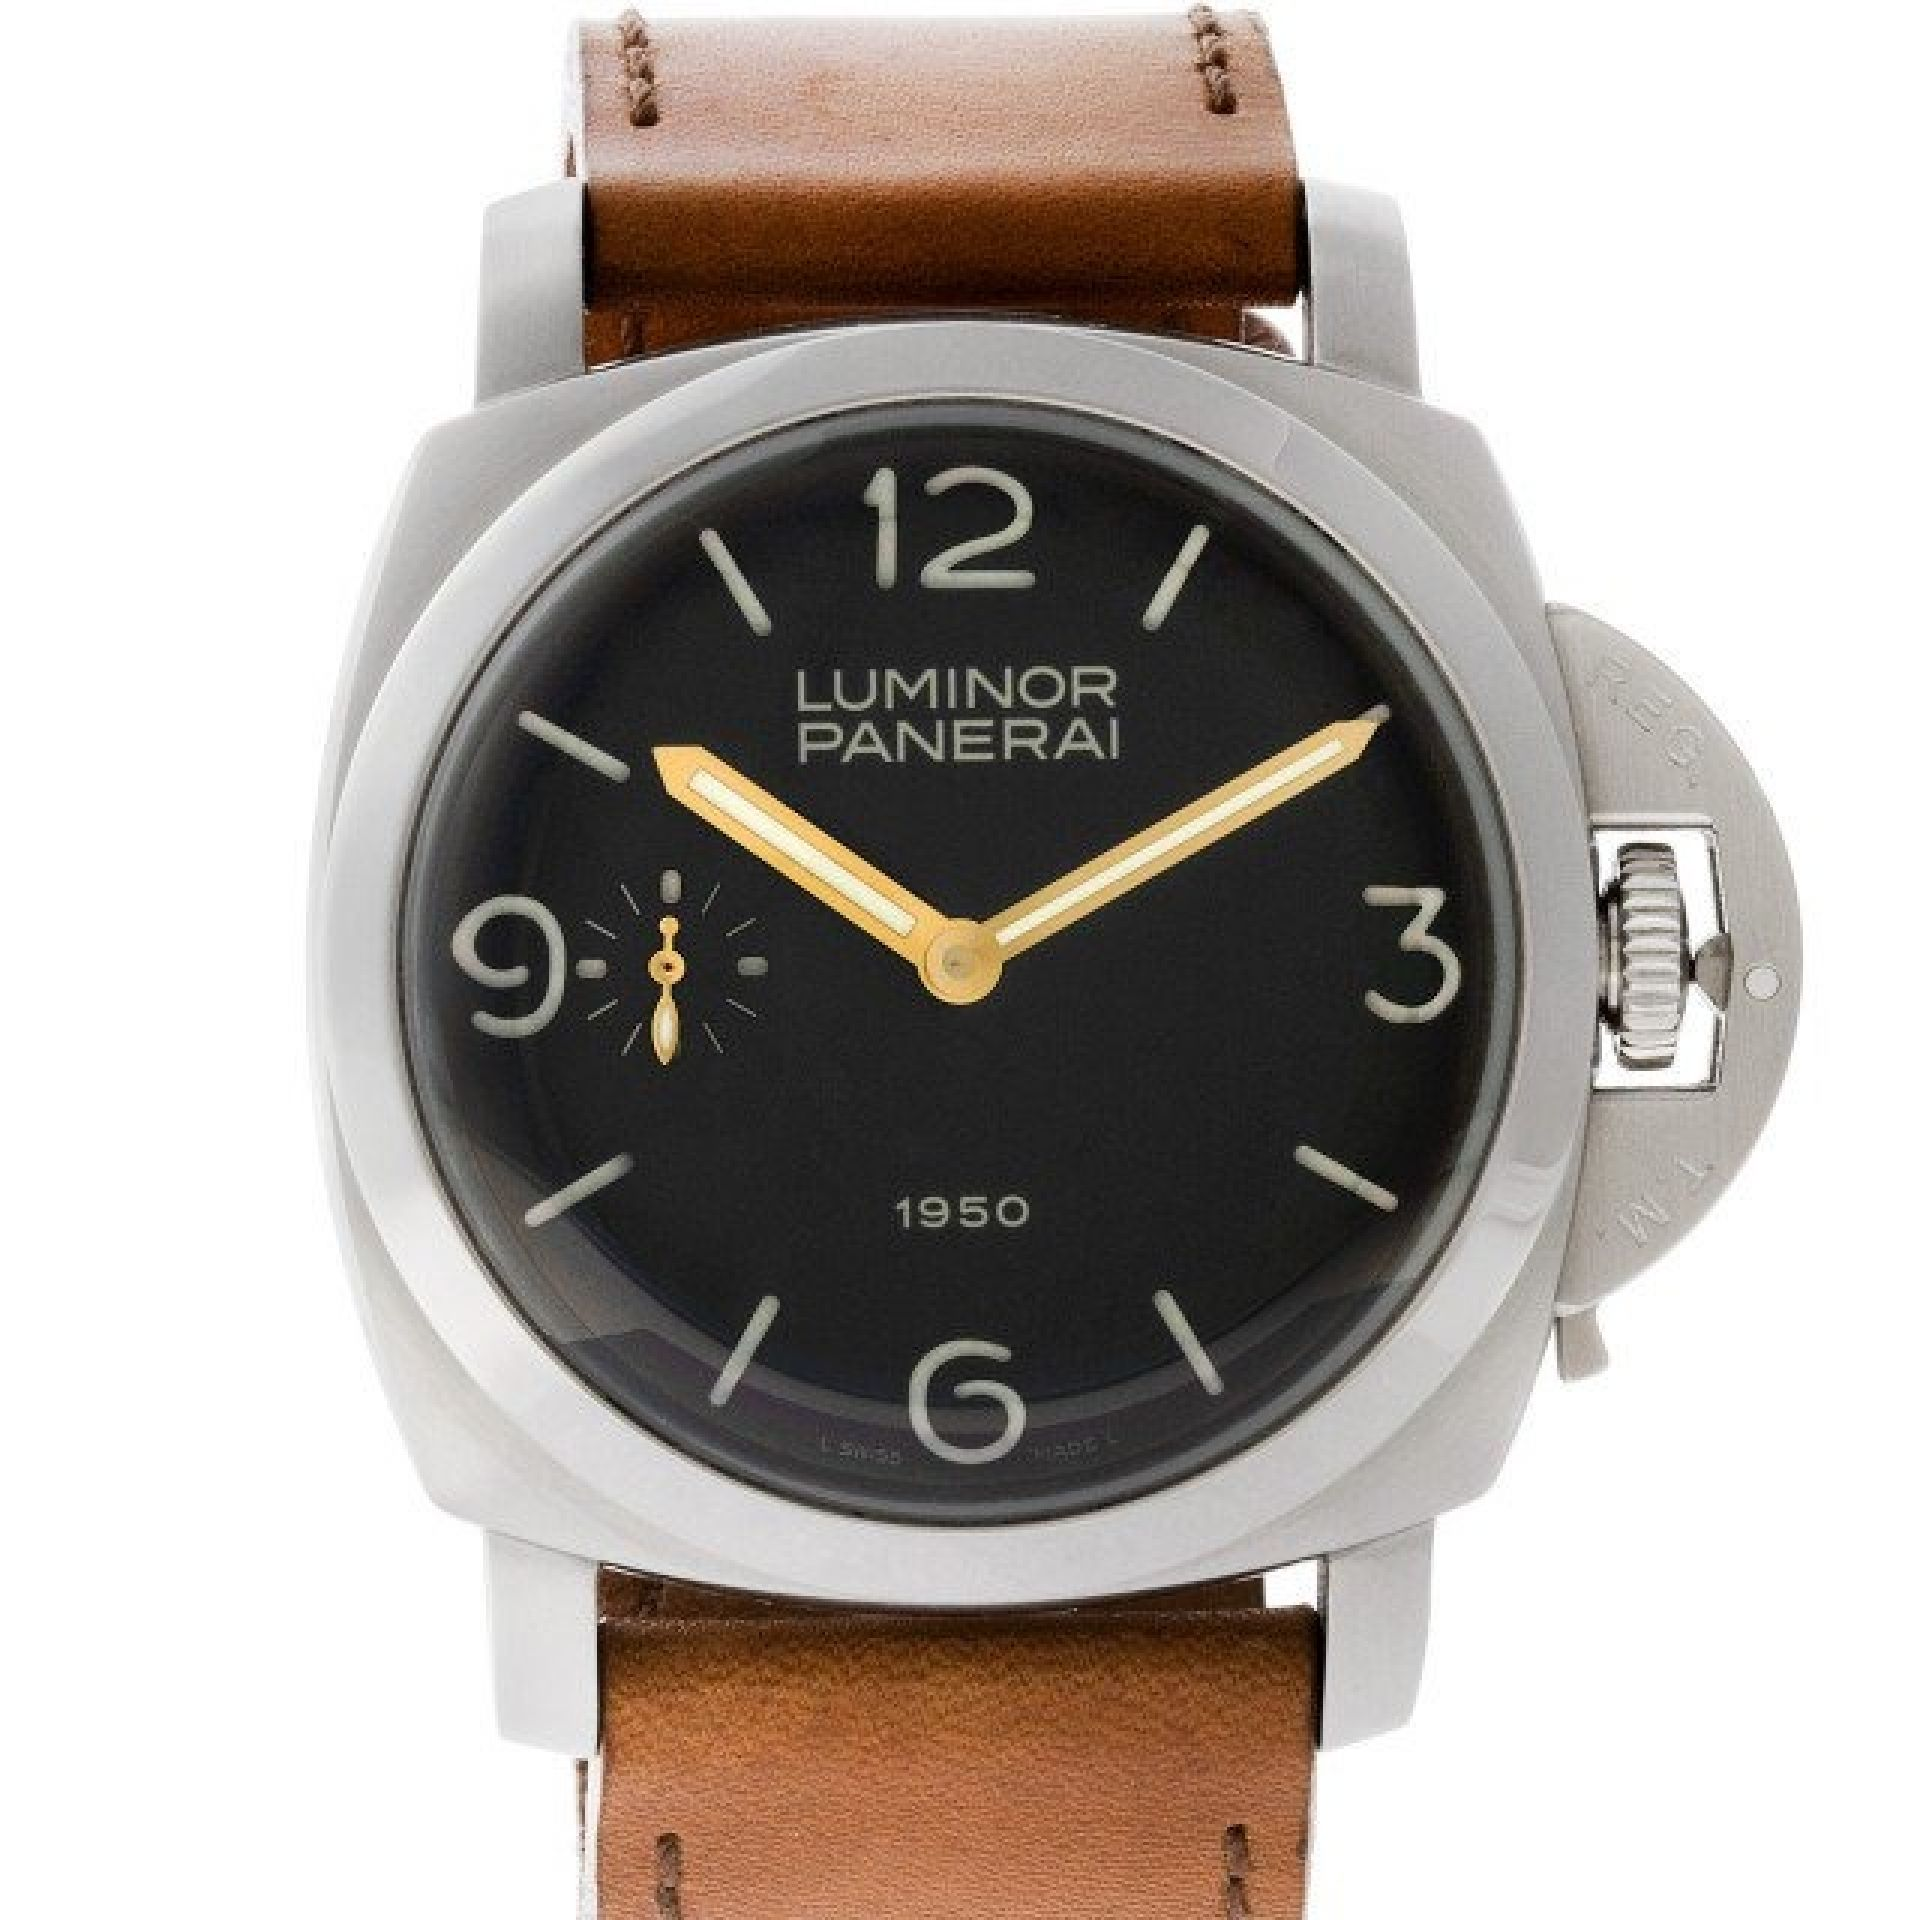 Panerai Luminor PAM00127 stainless steel Black dial 47mm Manual watch